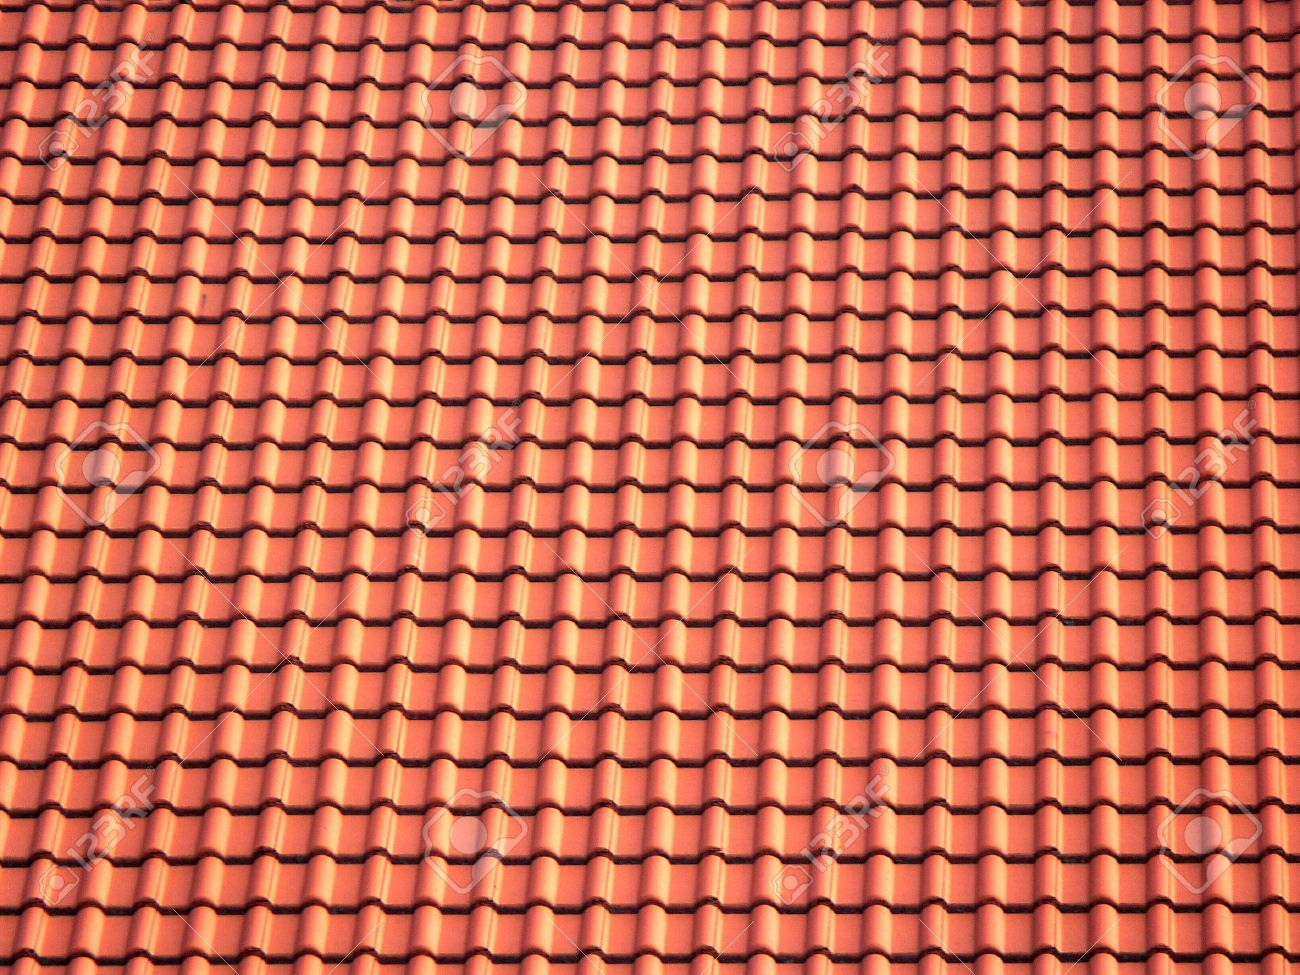 Roof ceramic tile choice image tile flooring design ideas ceramic roofing tile gallery tile flooring design ideas ceramic roofing tiles images tile flooring design ideas doublecrazyfo Gallery